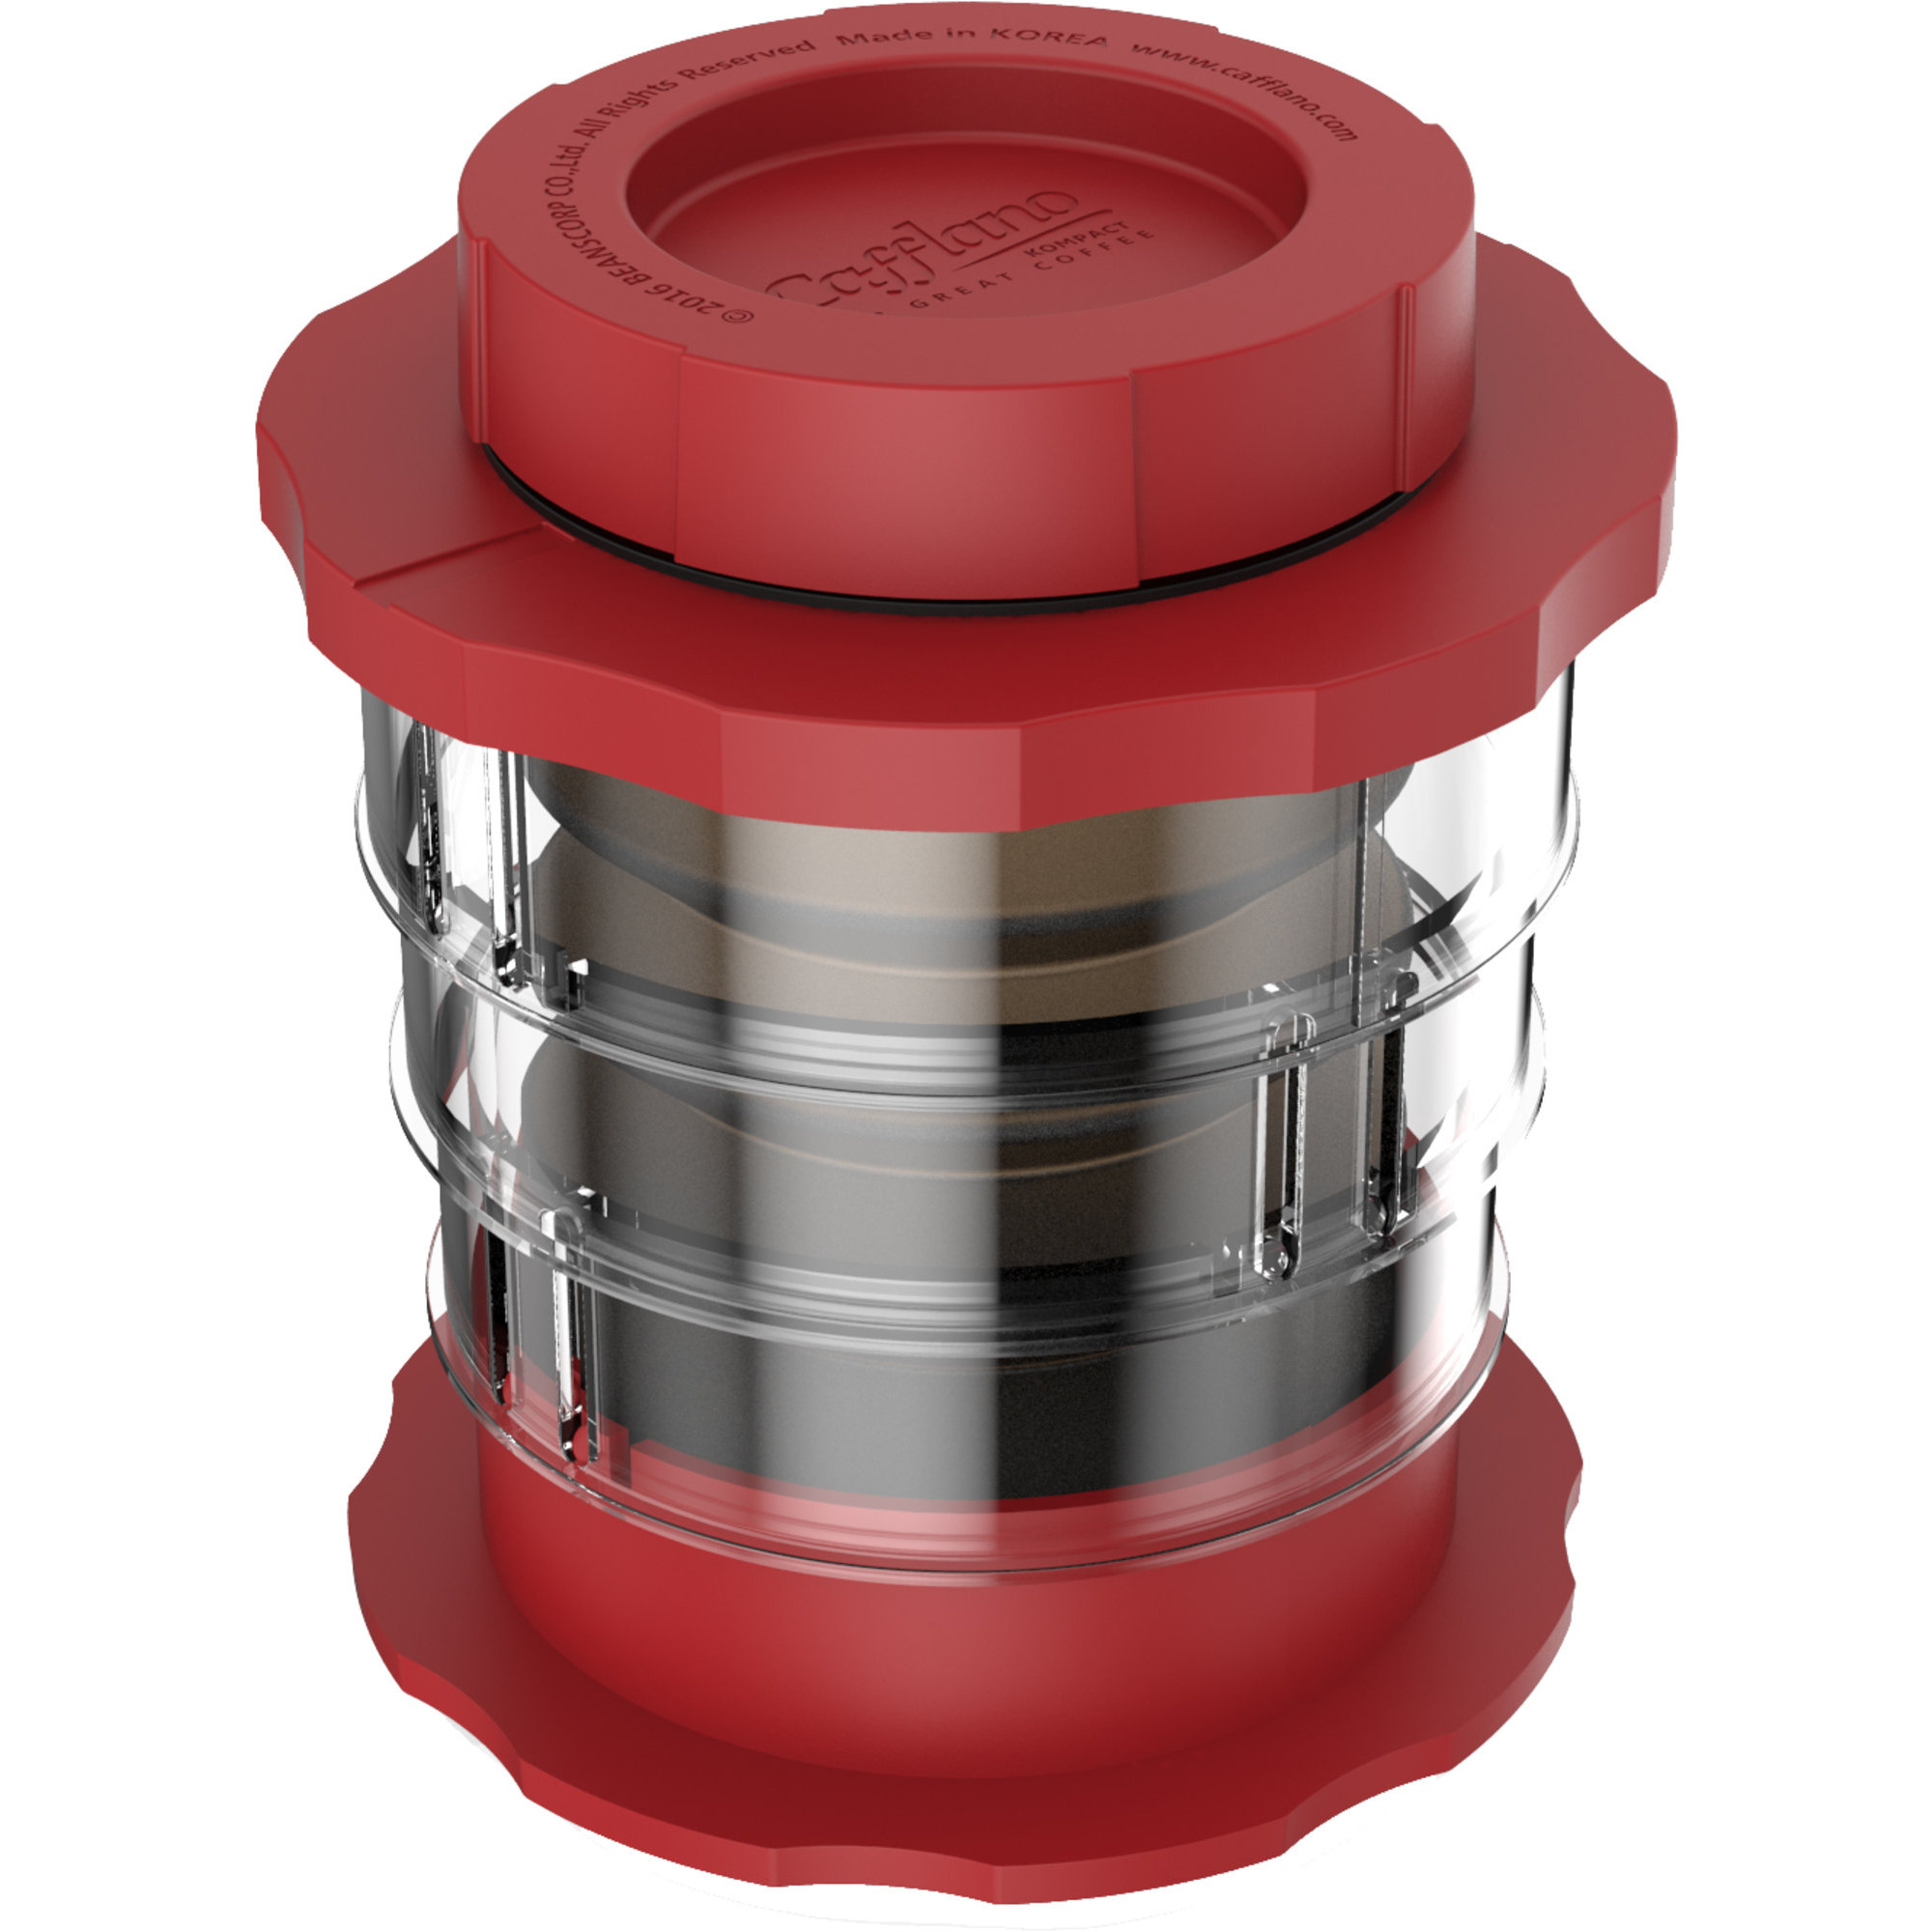 Cafflano Kompakt Kaffebryggare Röd